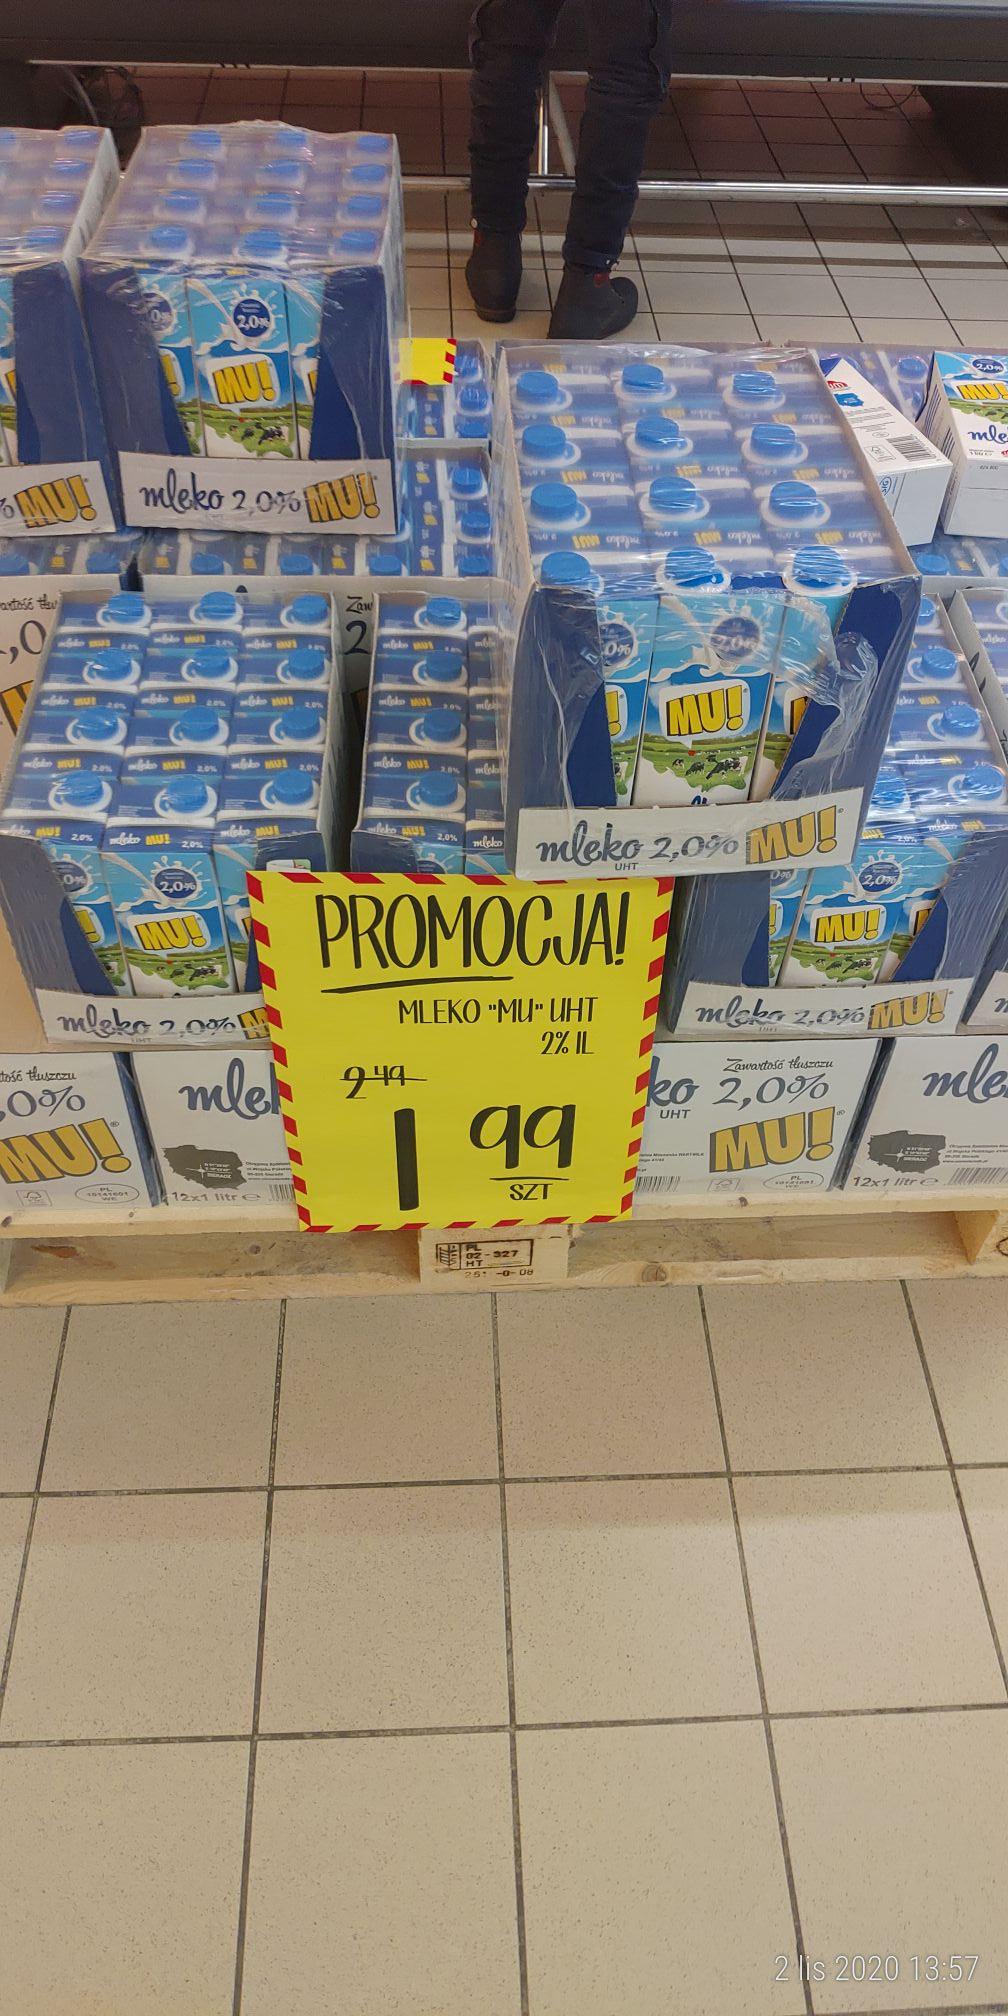 Mleko UHT 2,0% - Jan (Kęty)